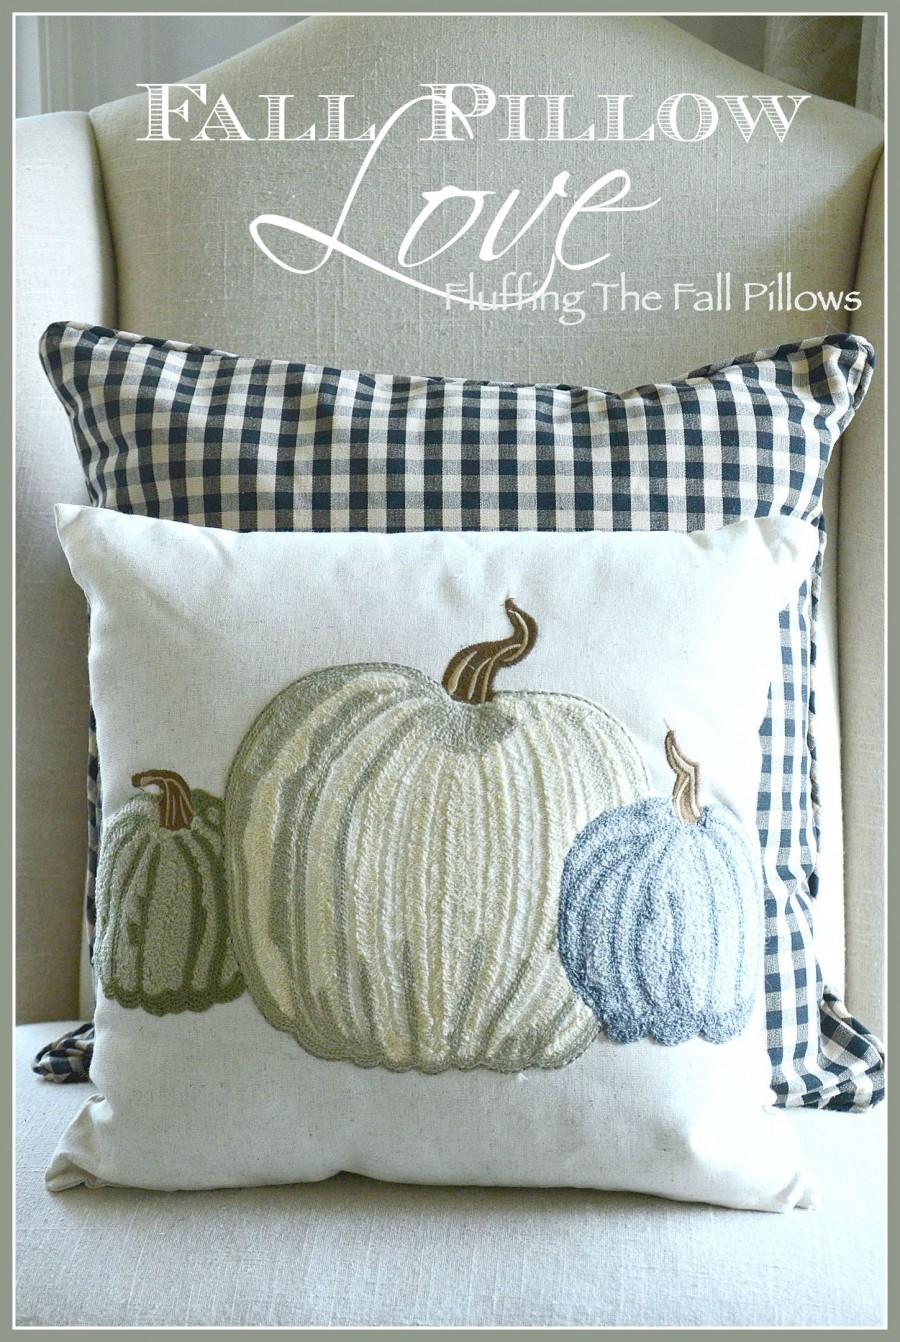 FALL PILLOWS-Enjoying the beauty of fall in your decor-stonegableblog.com